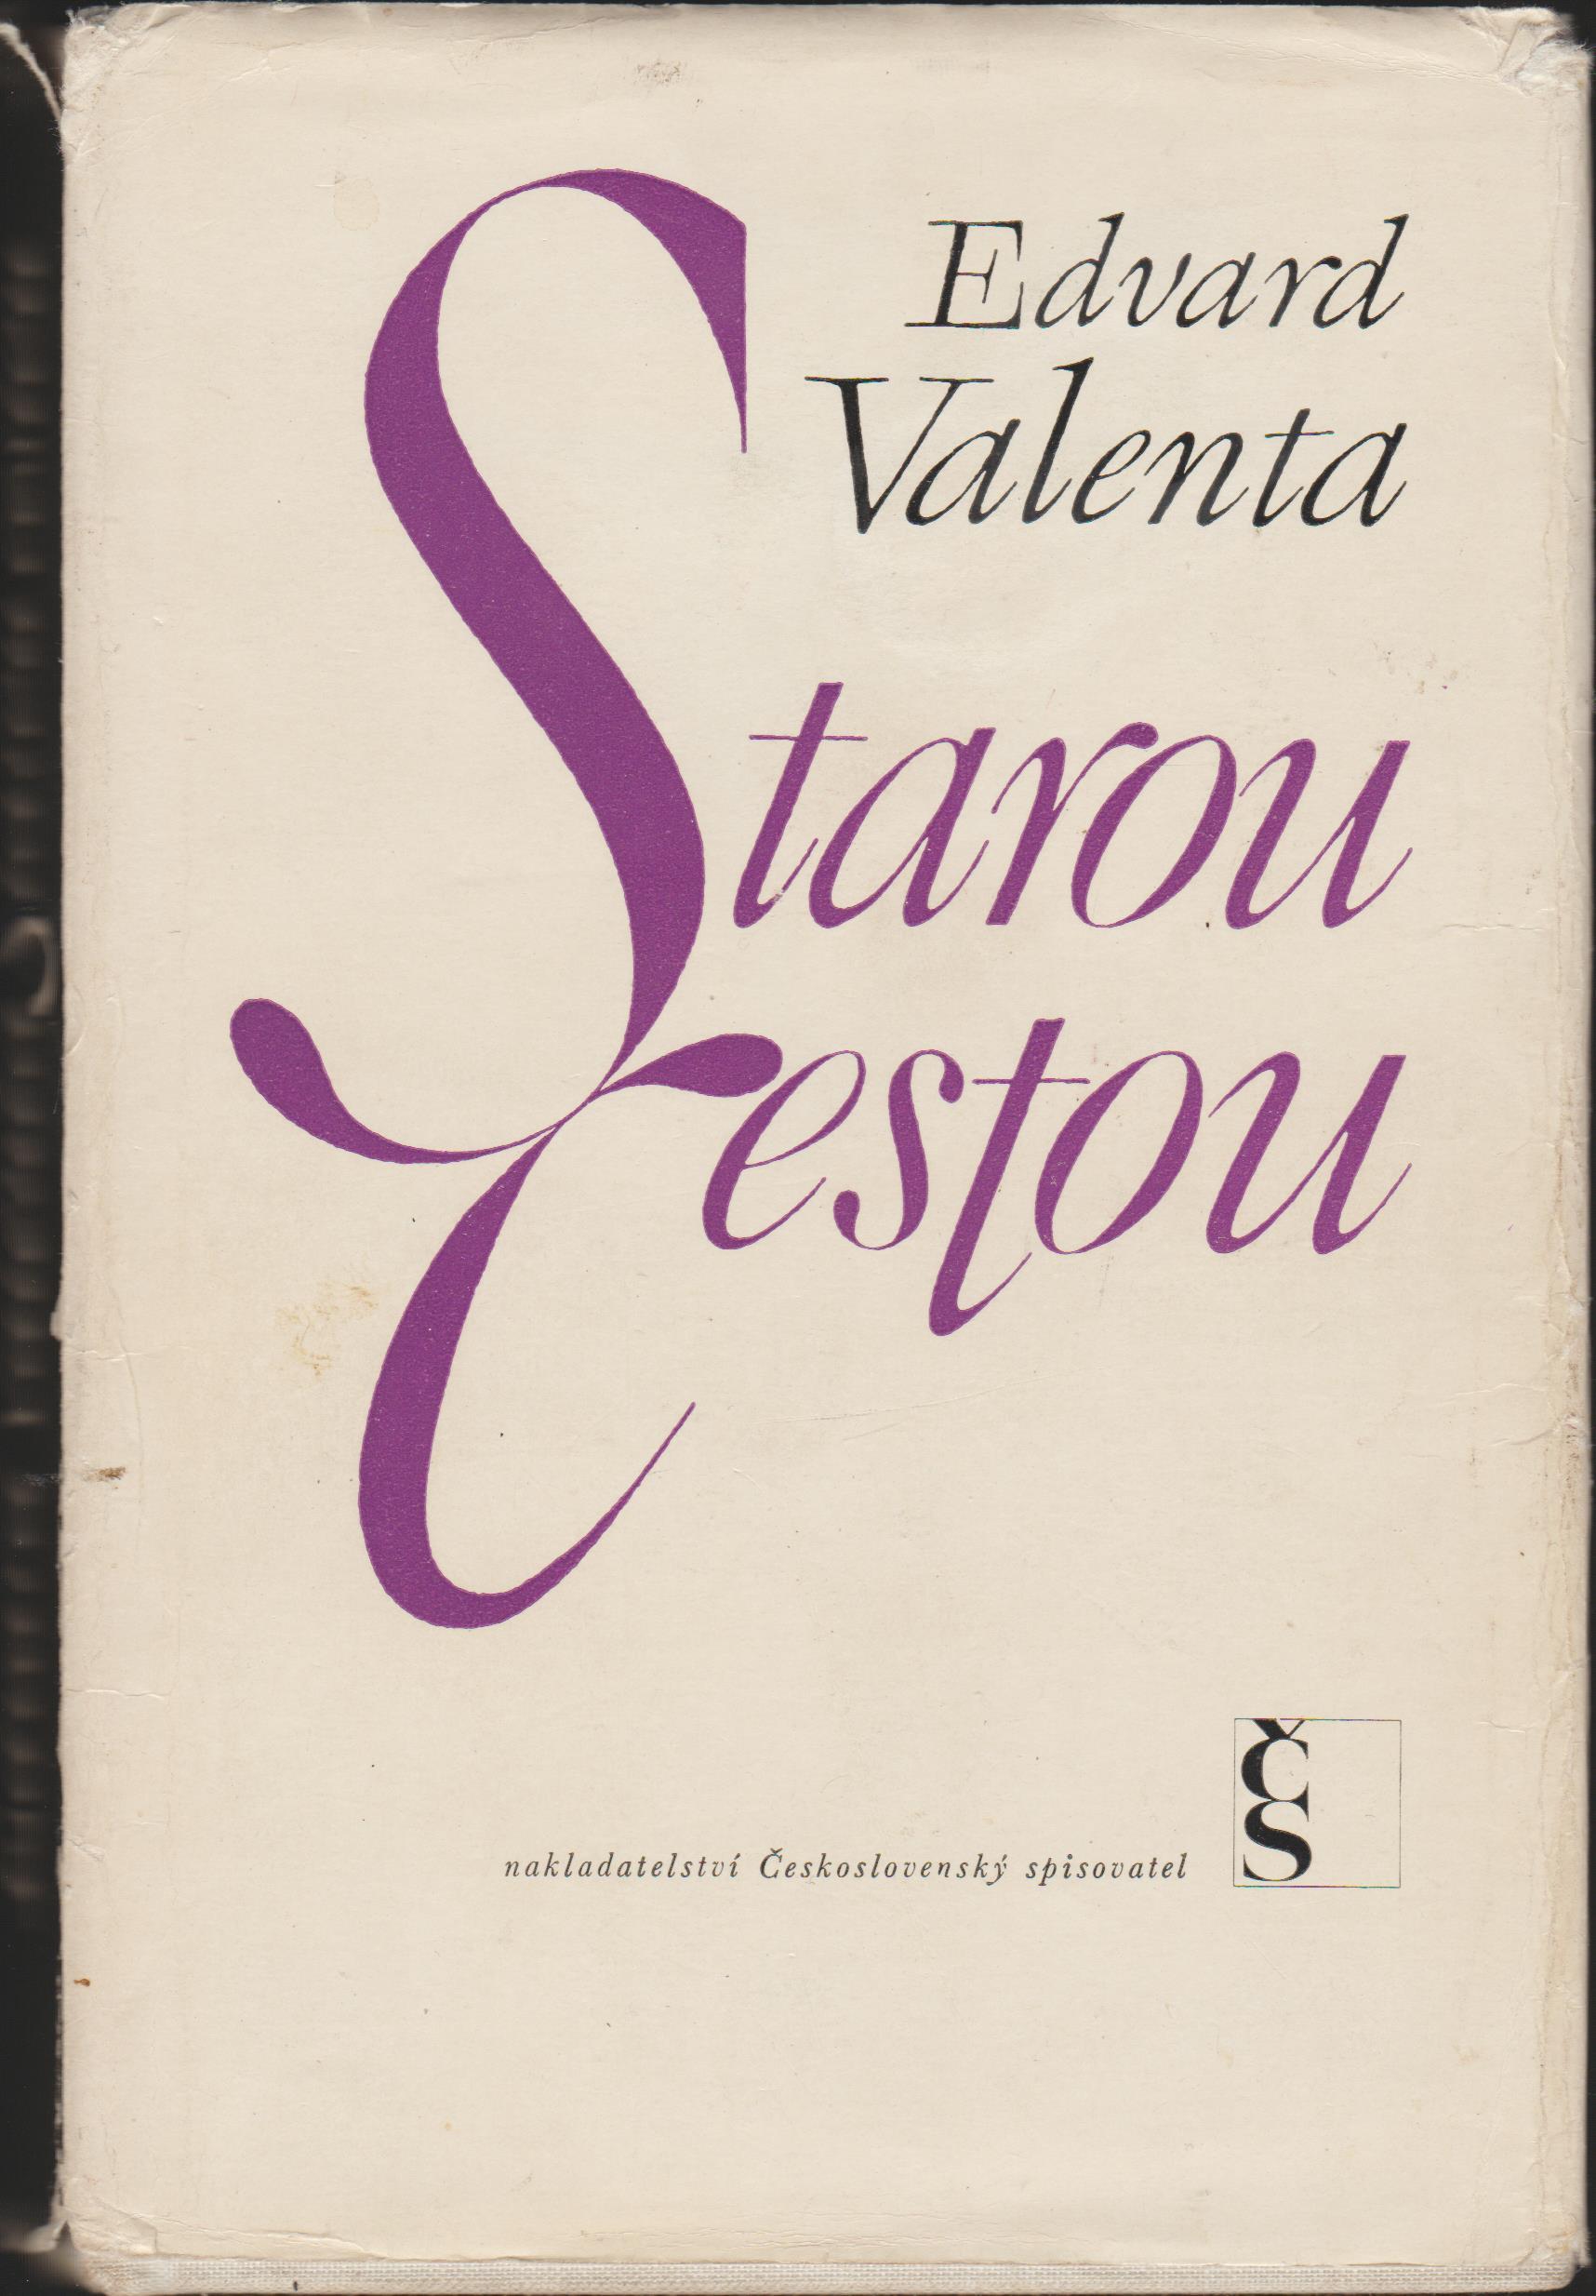 Starou Cestou - Edvard Valenta